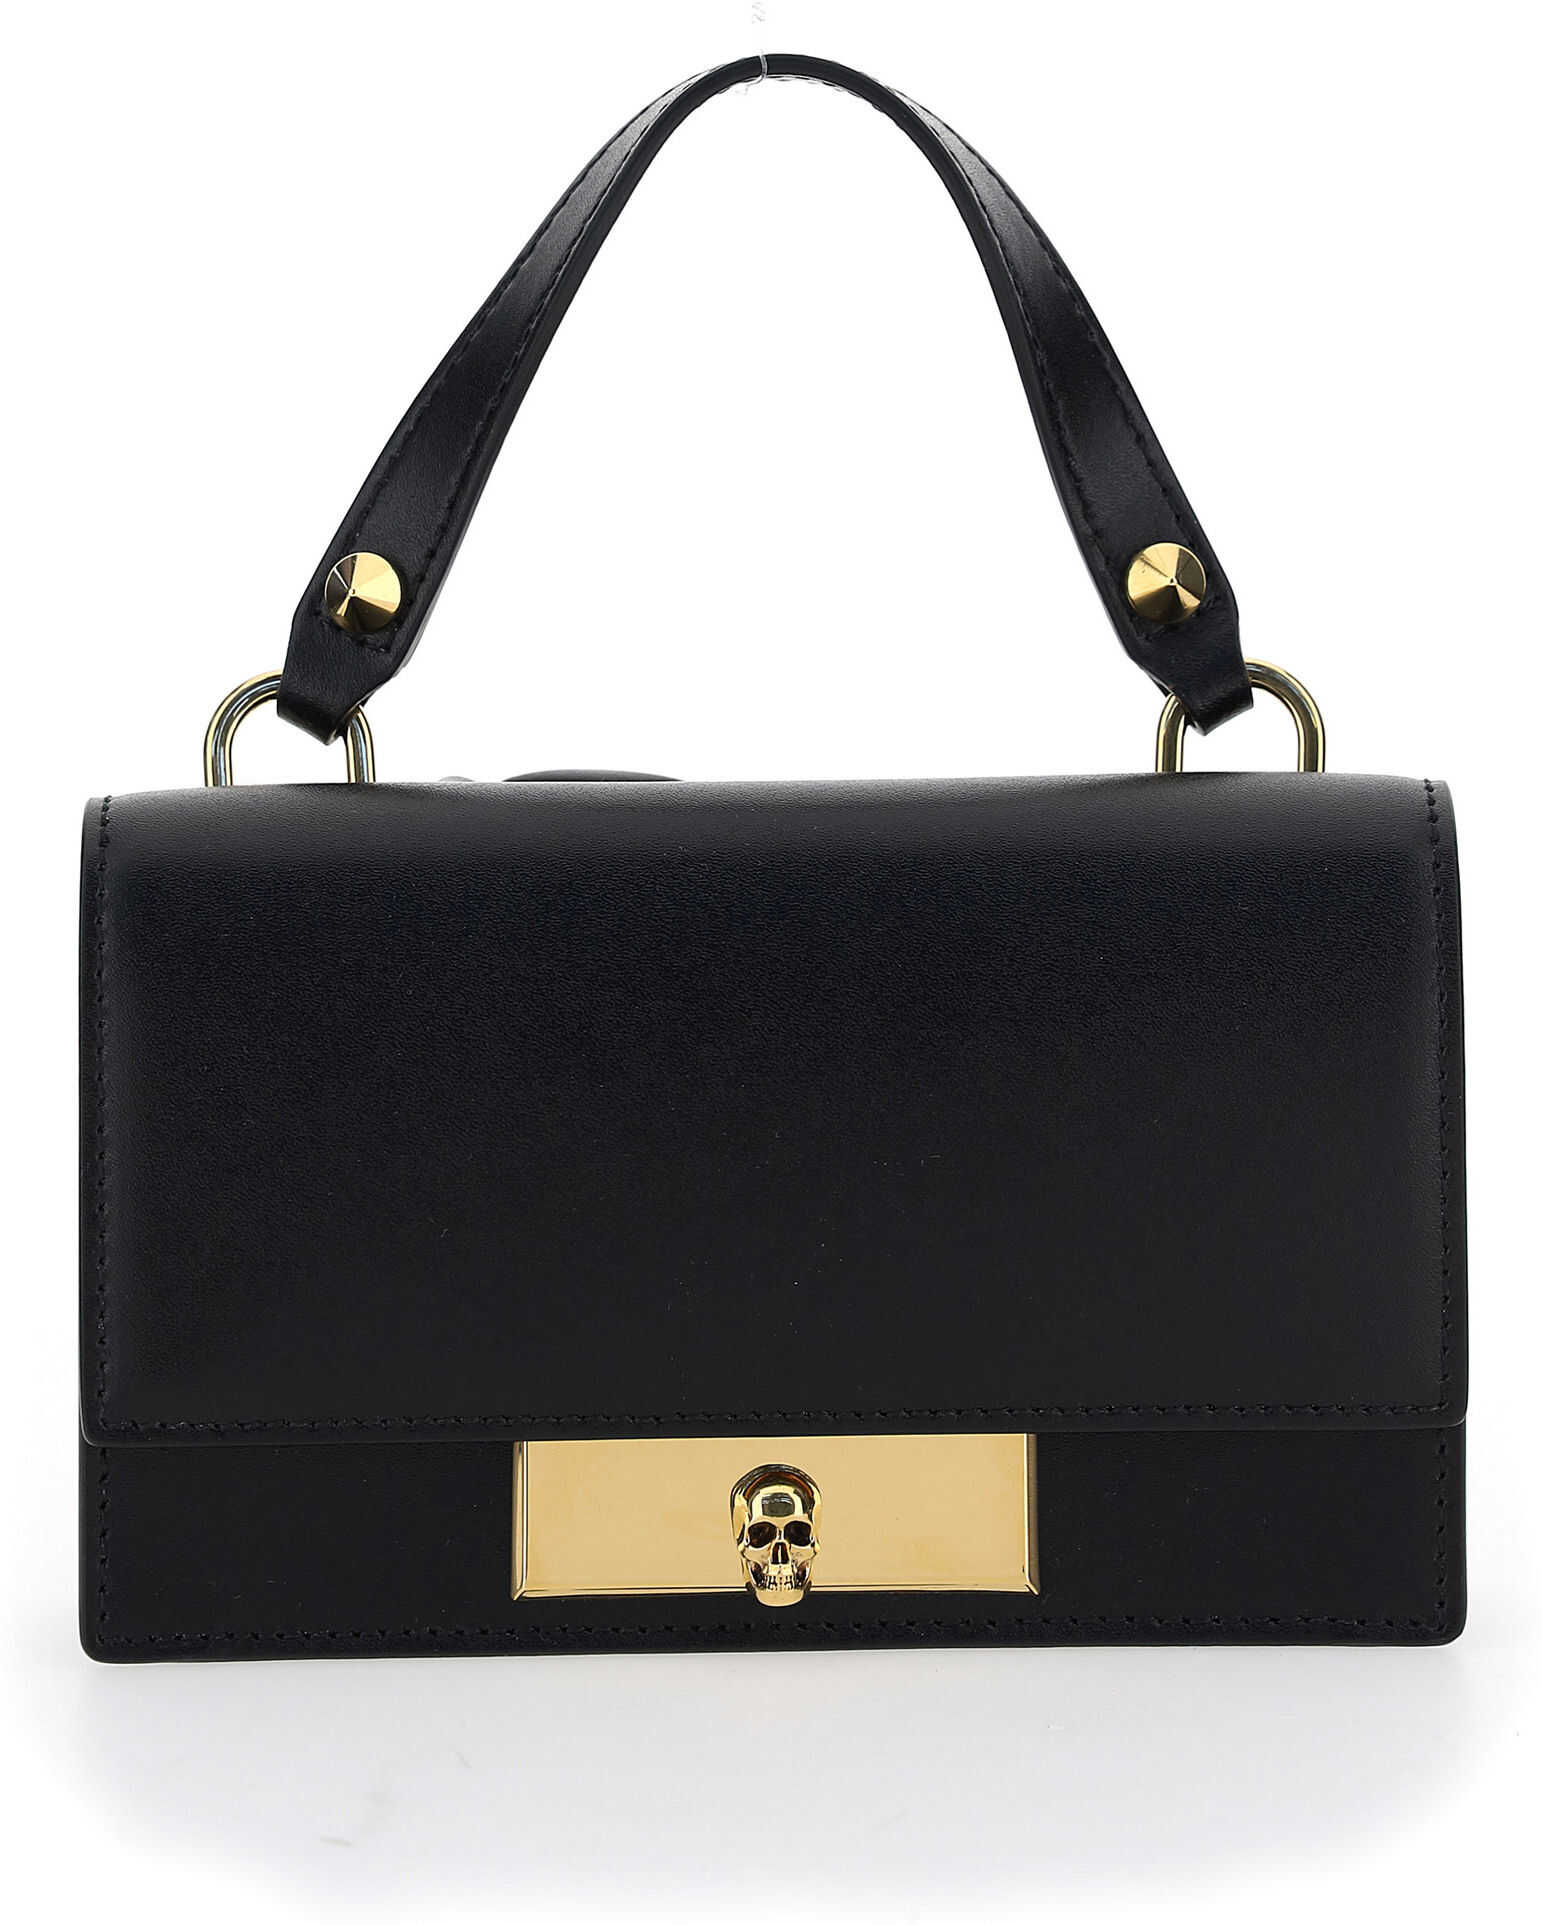 Alexander McQueen Liberty Mini Handbag 6282591CW00 BLACK imagine b-mall.ro